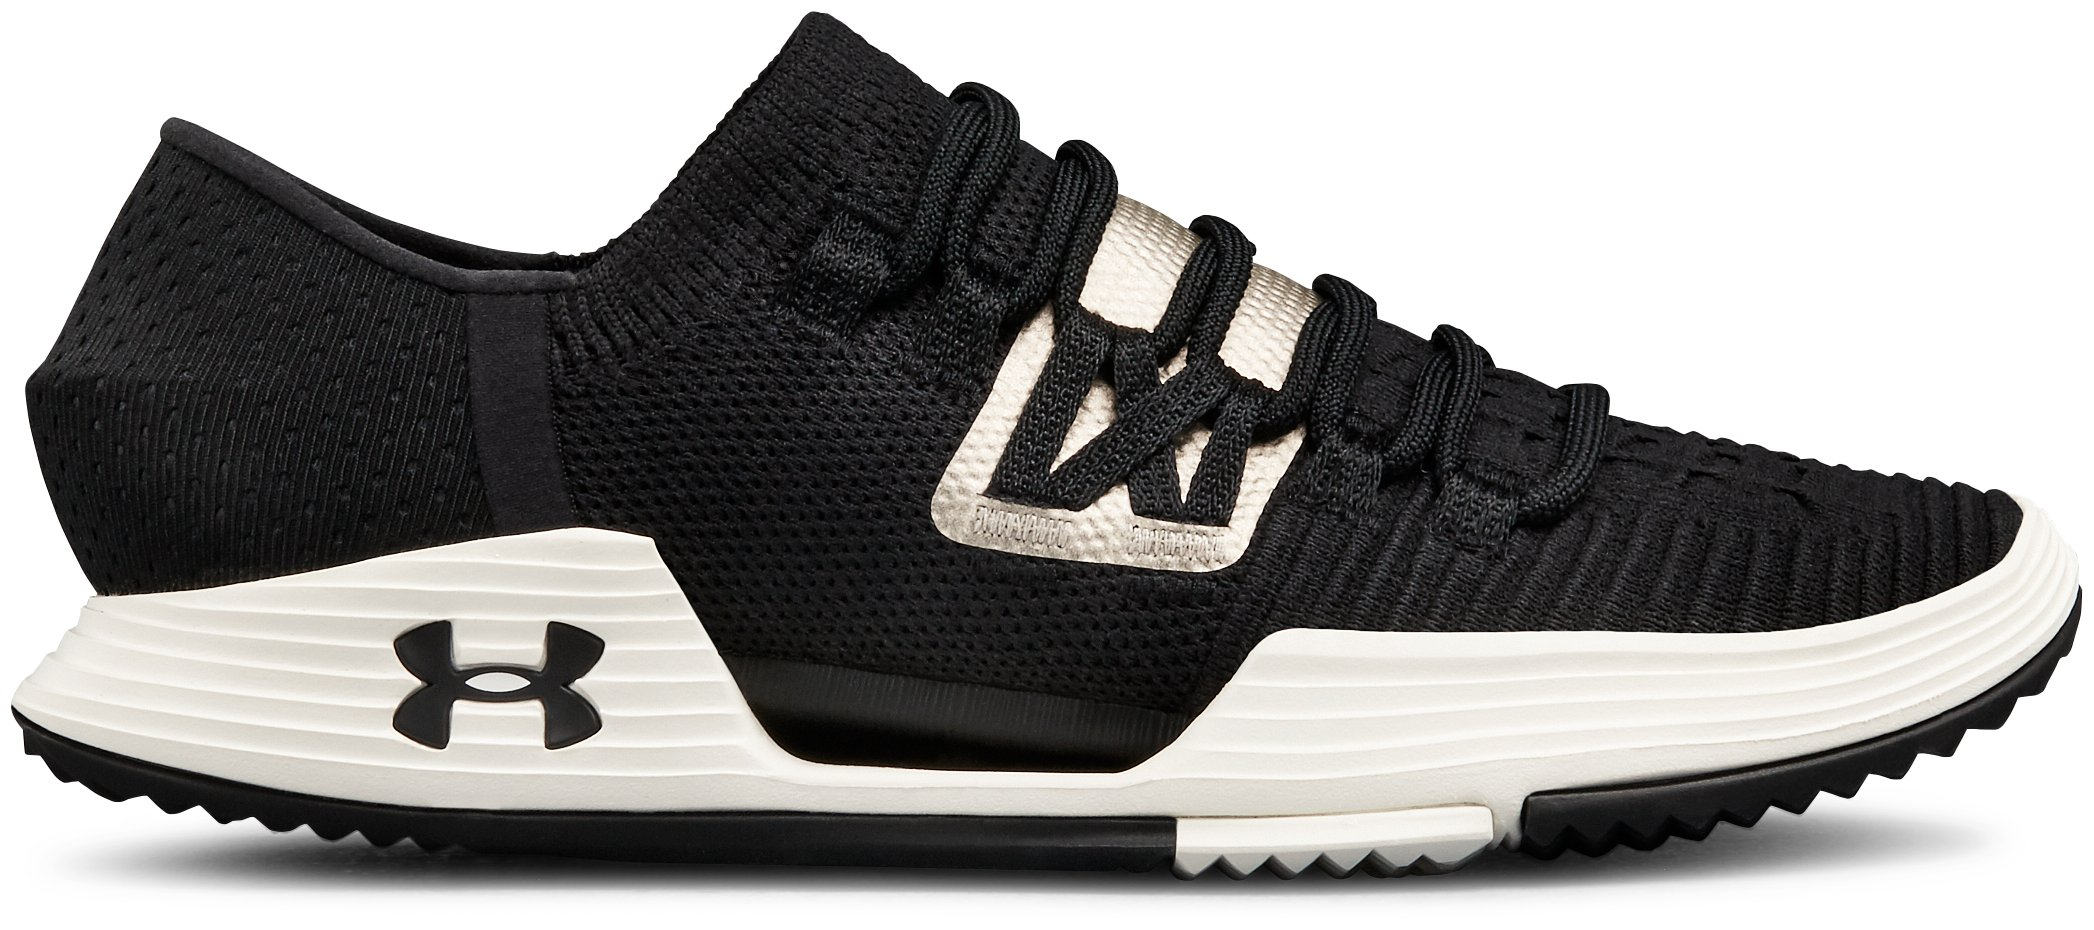 Sepatu Olahraga UA SpeedForm® AMP 3.0 untuk Wanita, 360 degree view